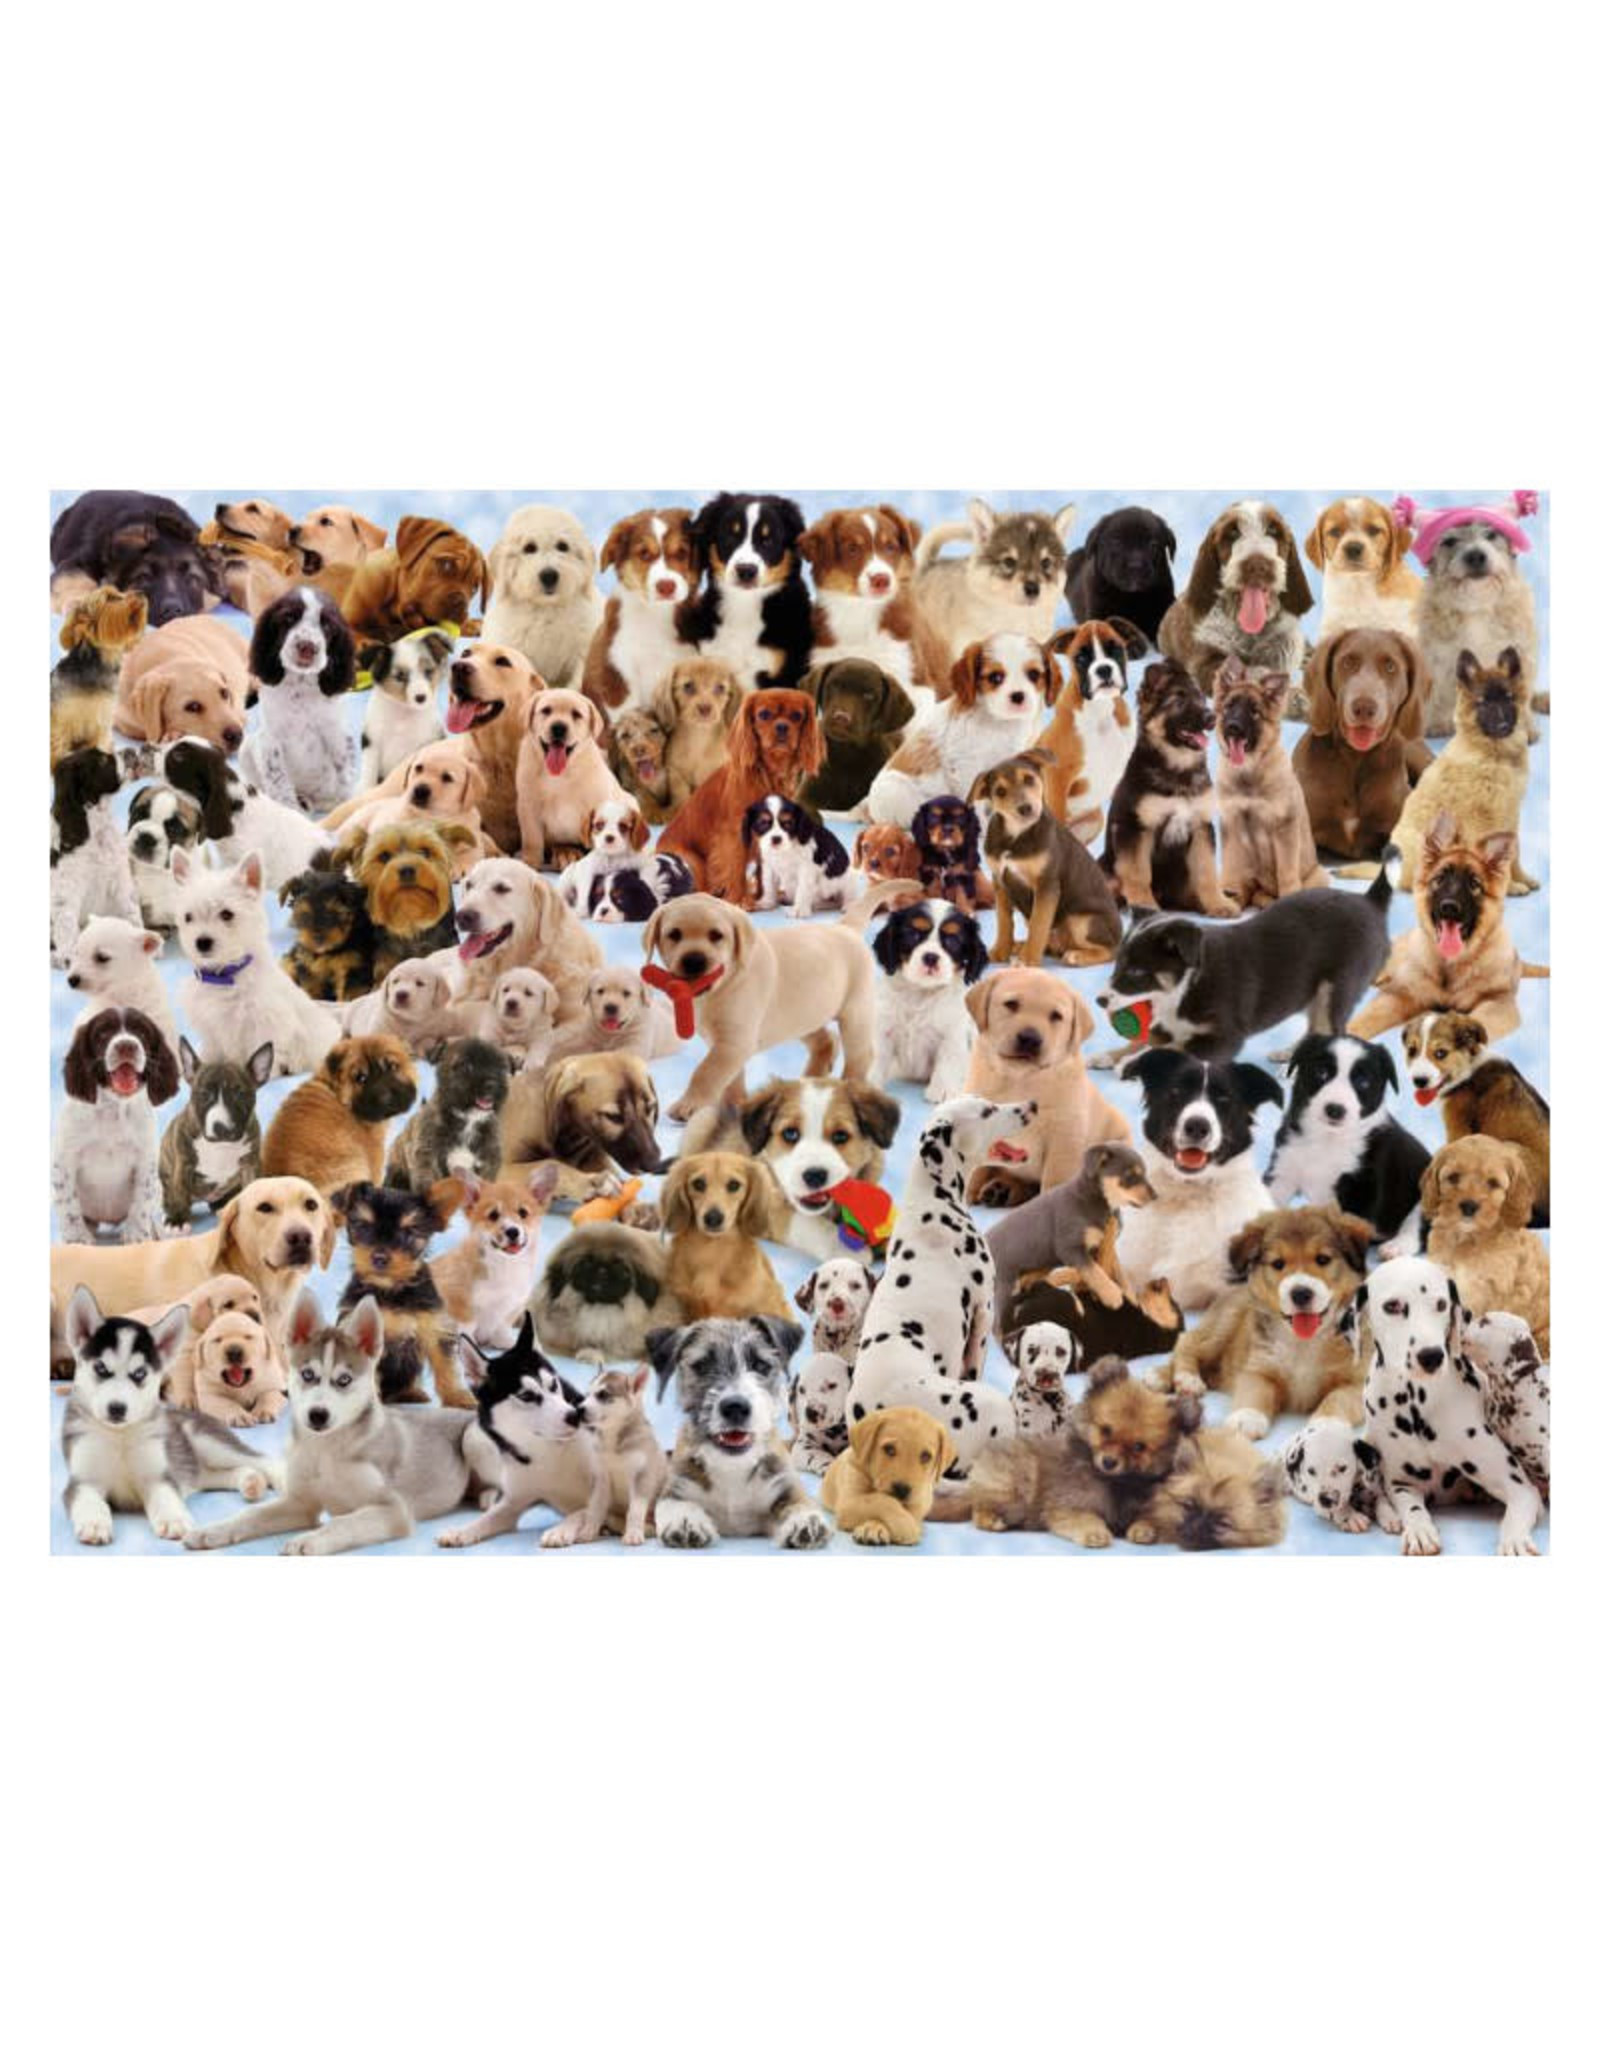 Ravensburger Dogs Galore Puzzle 1000 PCS